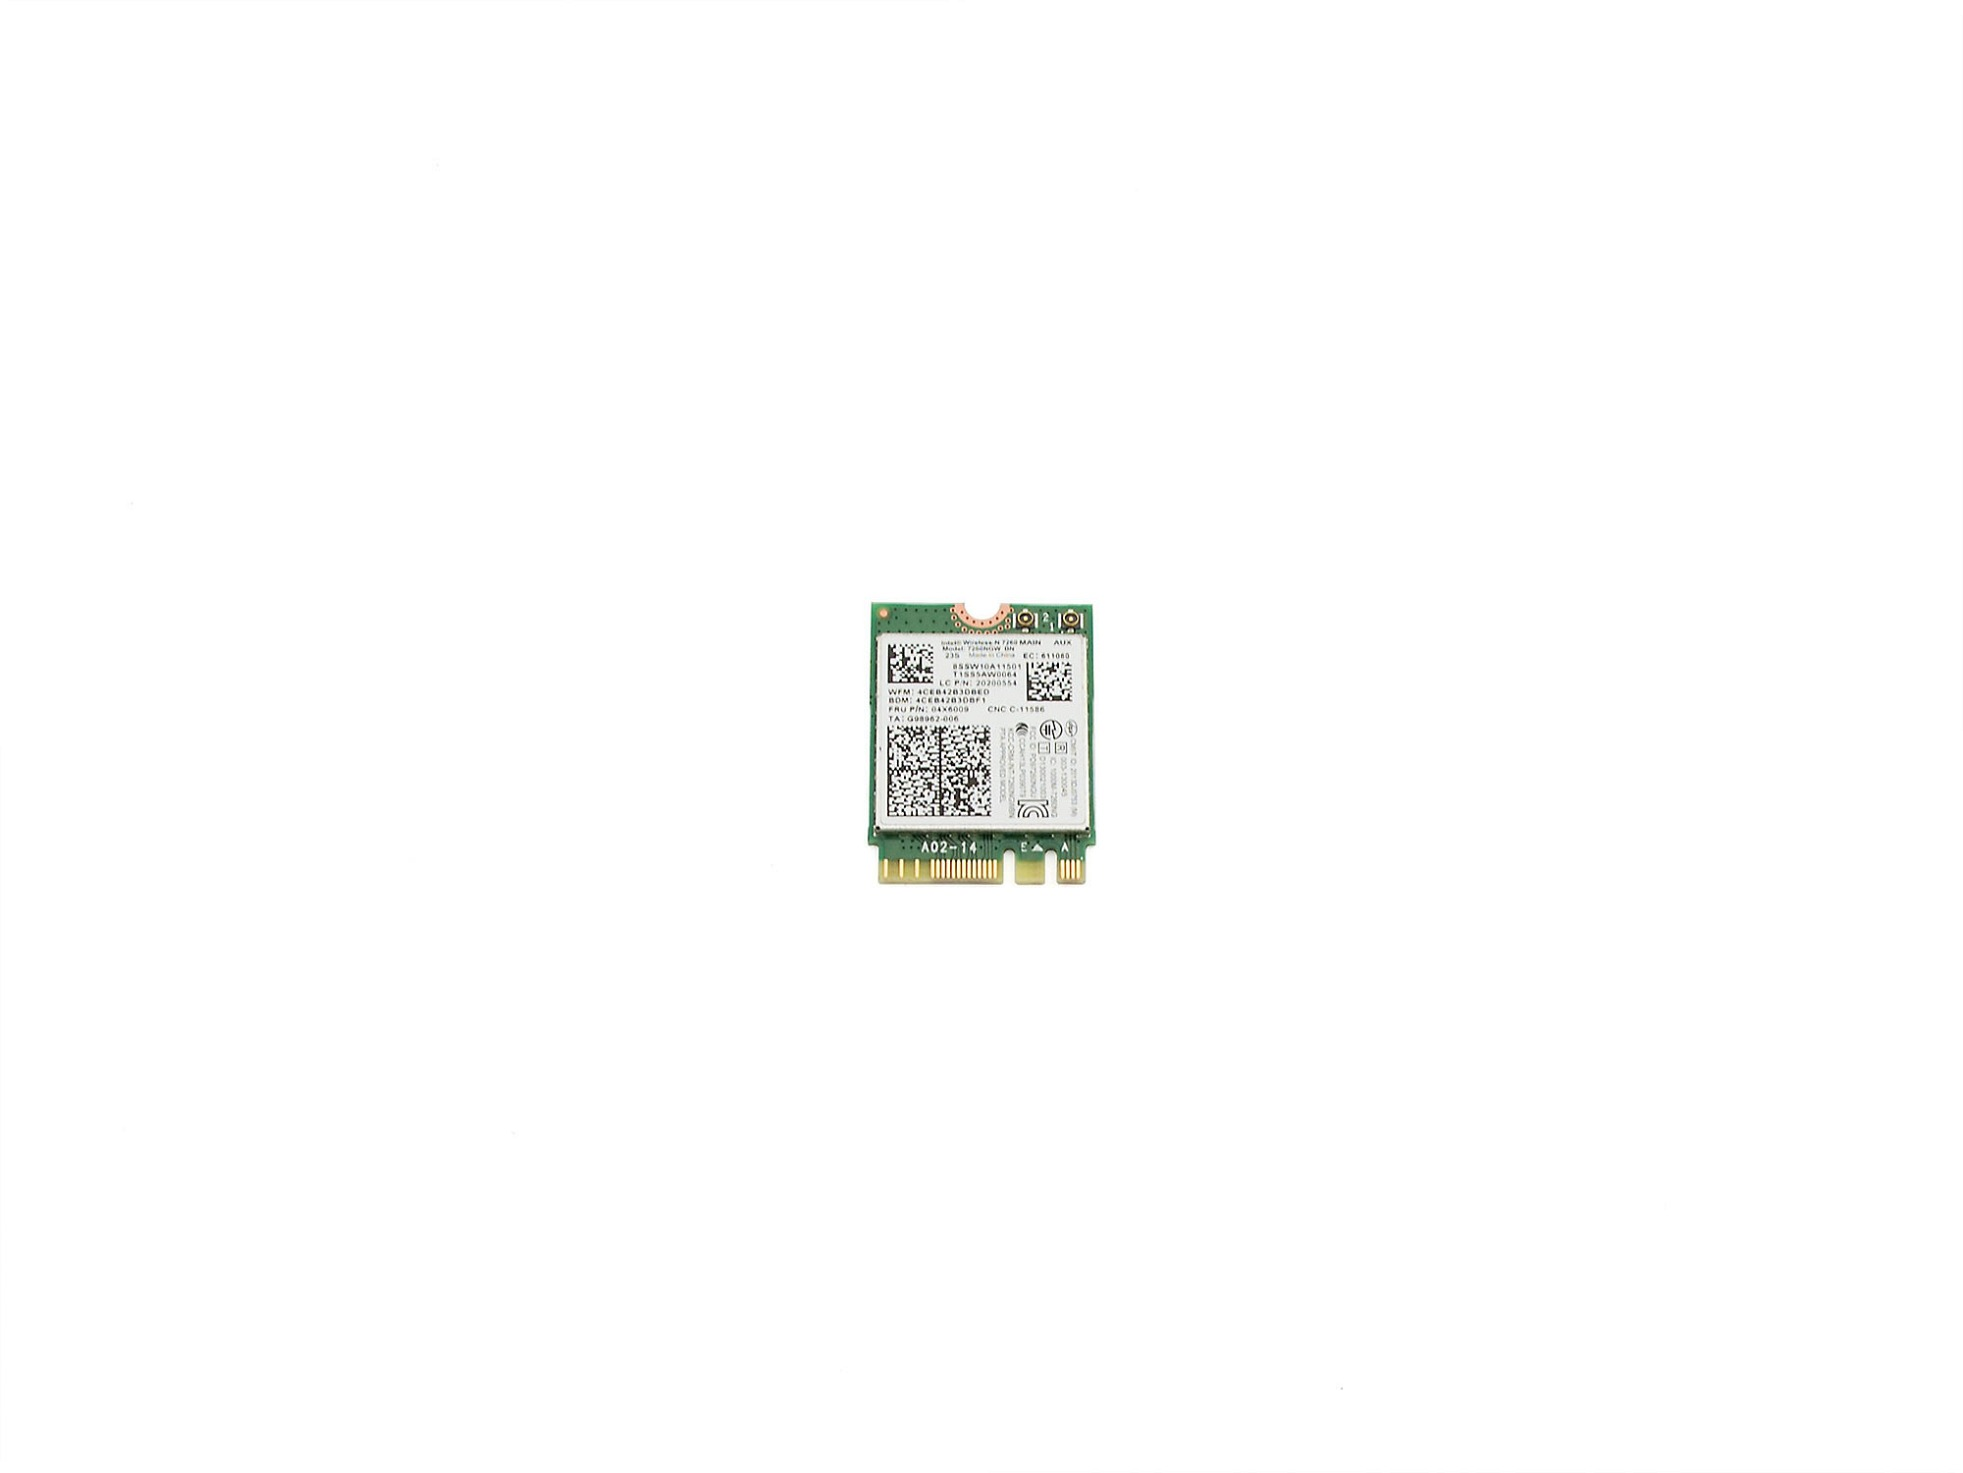 Intel Wireless-N 7260 MAIN für Lenovo ThinkPad L540 (20AU/20AV) Serie